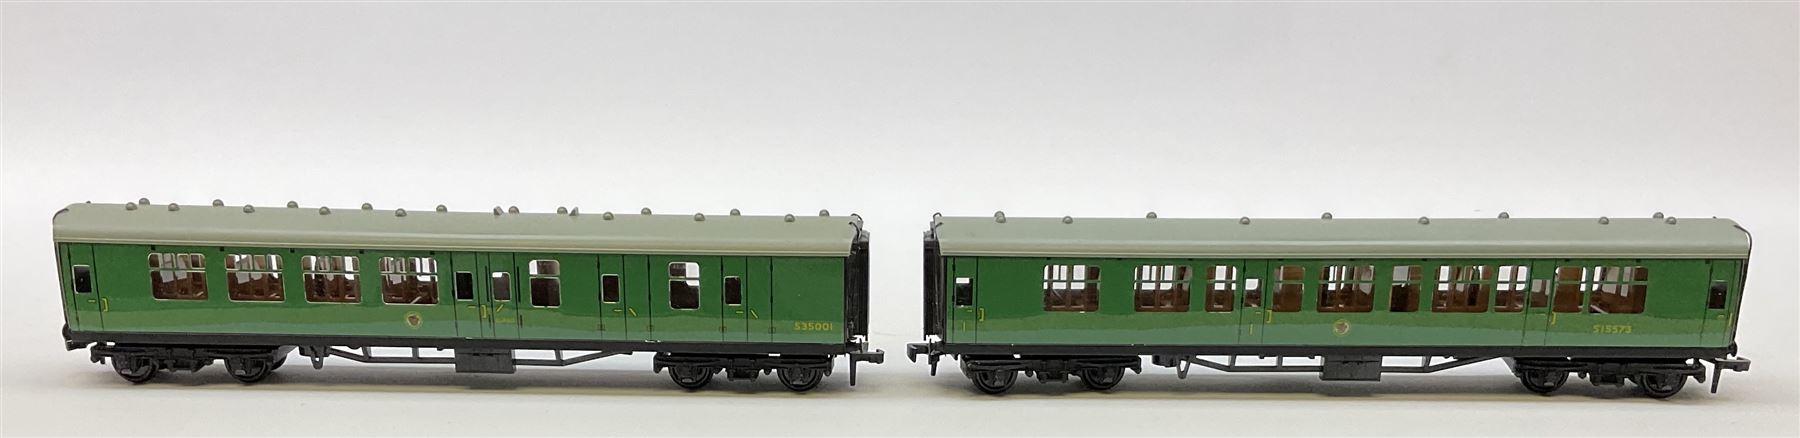 Hornby Dublo - six coaches comprising 4050 Corridor Coach 1st/2nd W.R.; 4051 Corridor Coach Brake/2n - Image 4 of 5